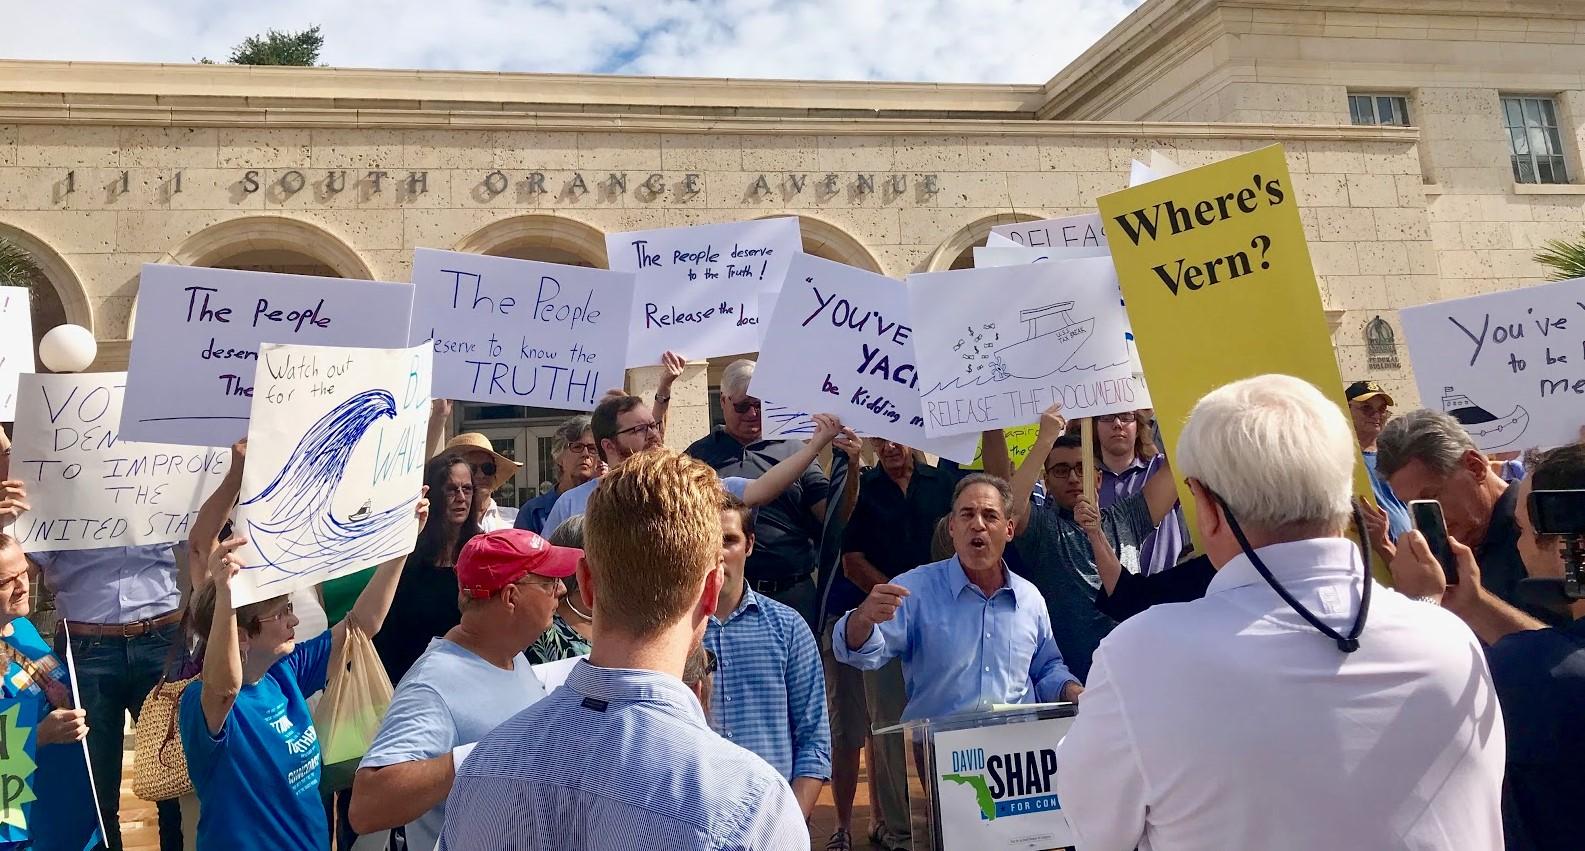 David-Shapiro-Vern-Buchanan-yacht-protest.jpeg